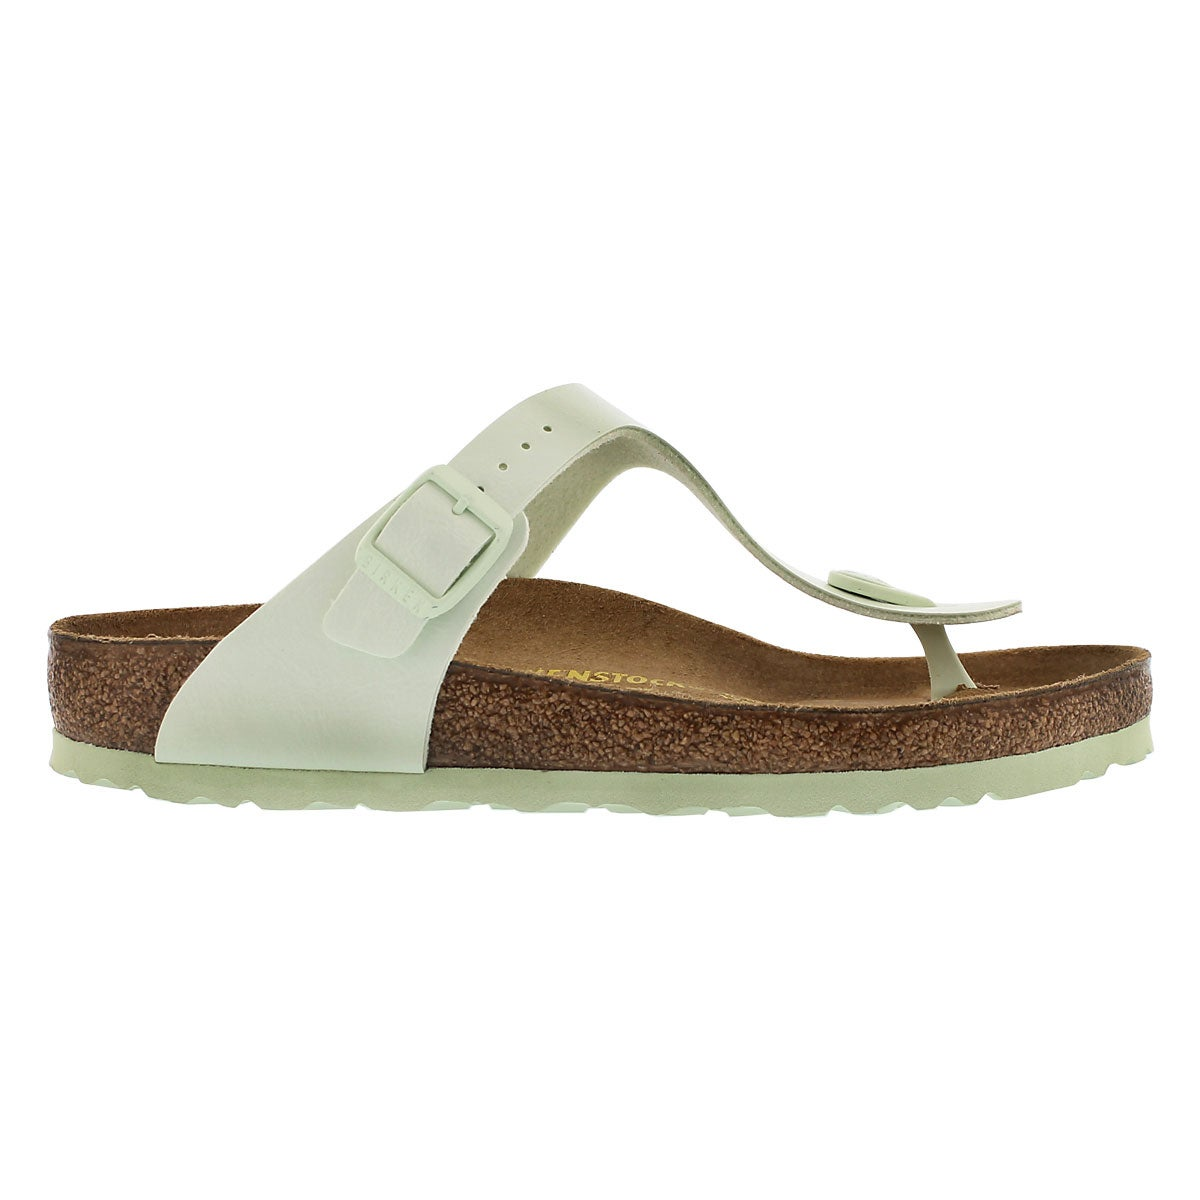 Sandale tong Gizeh, menthe, femmes